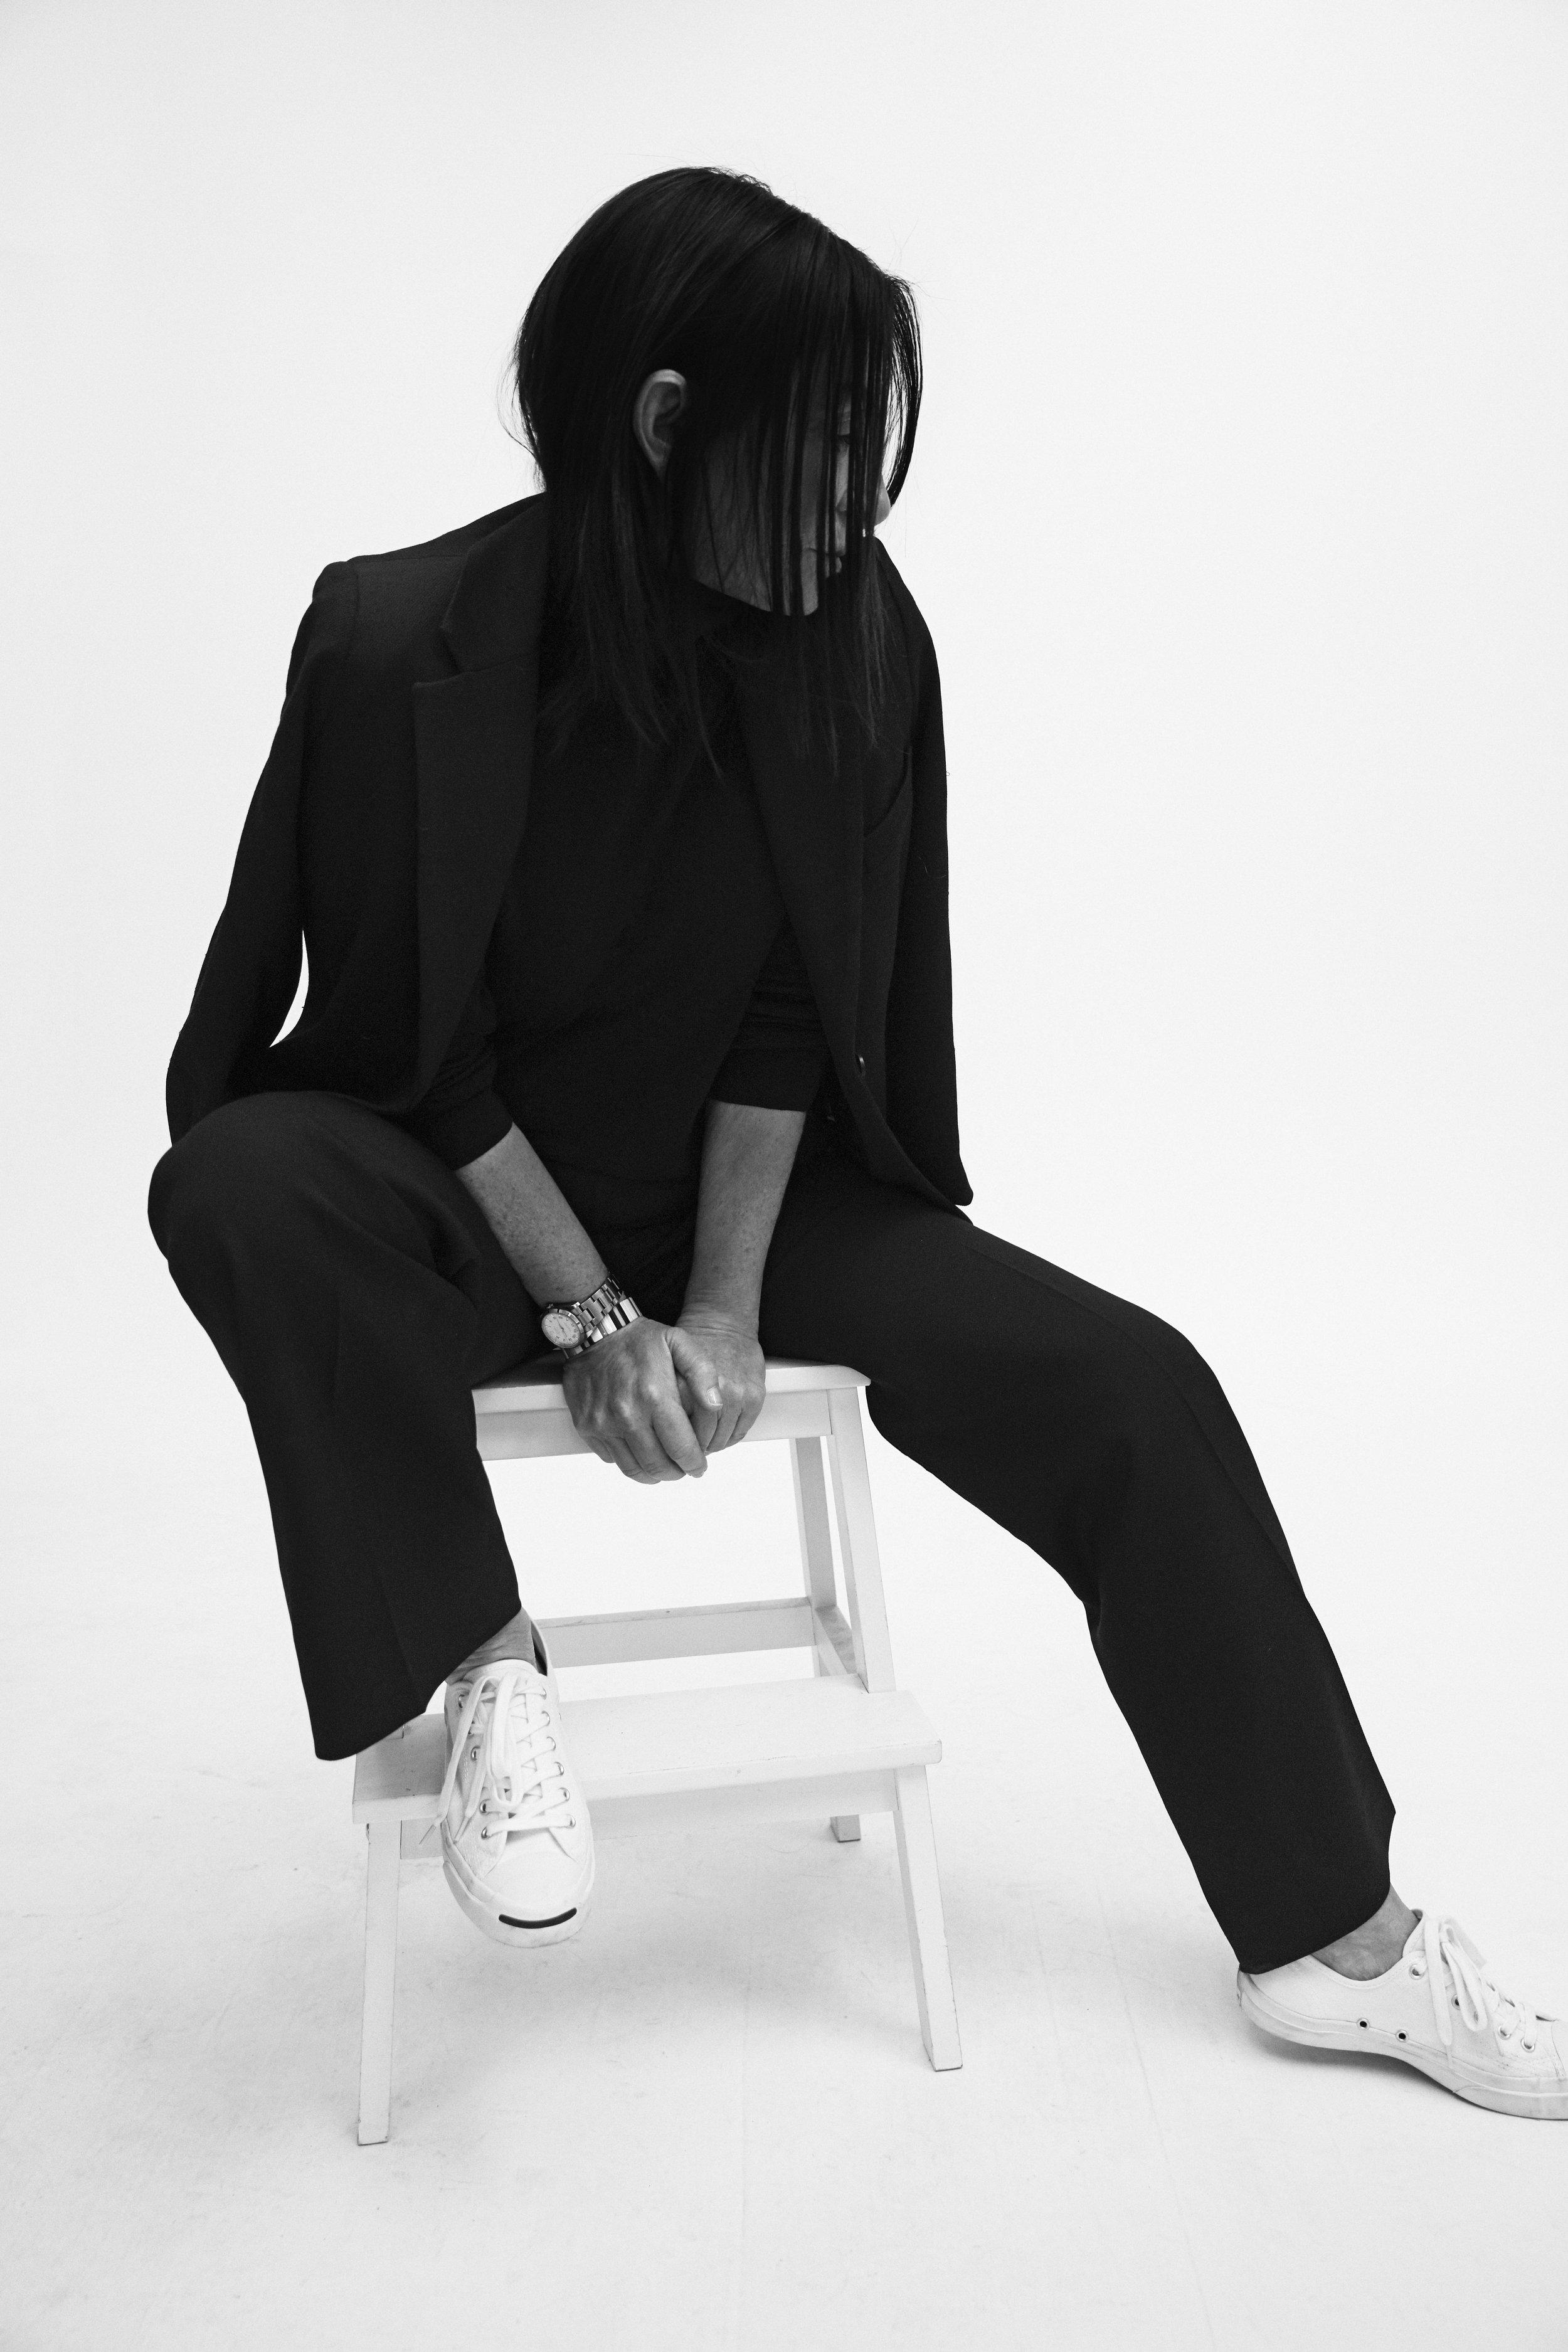 RA PORTRAIT 318 - We Interviewed The Jewelry Designer Roxanne Assoulin